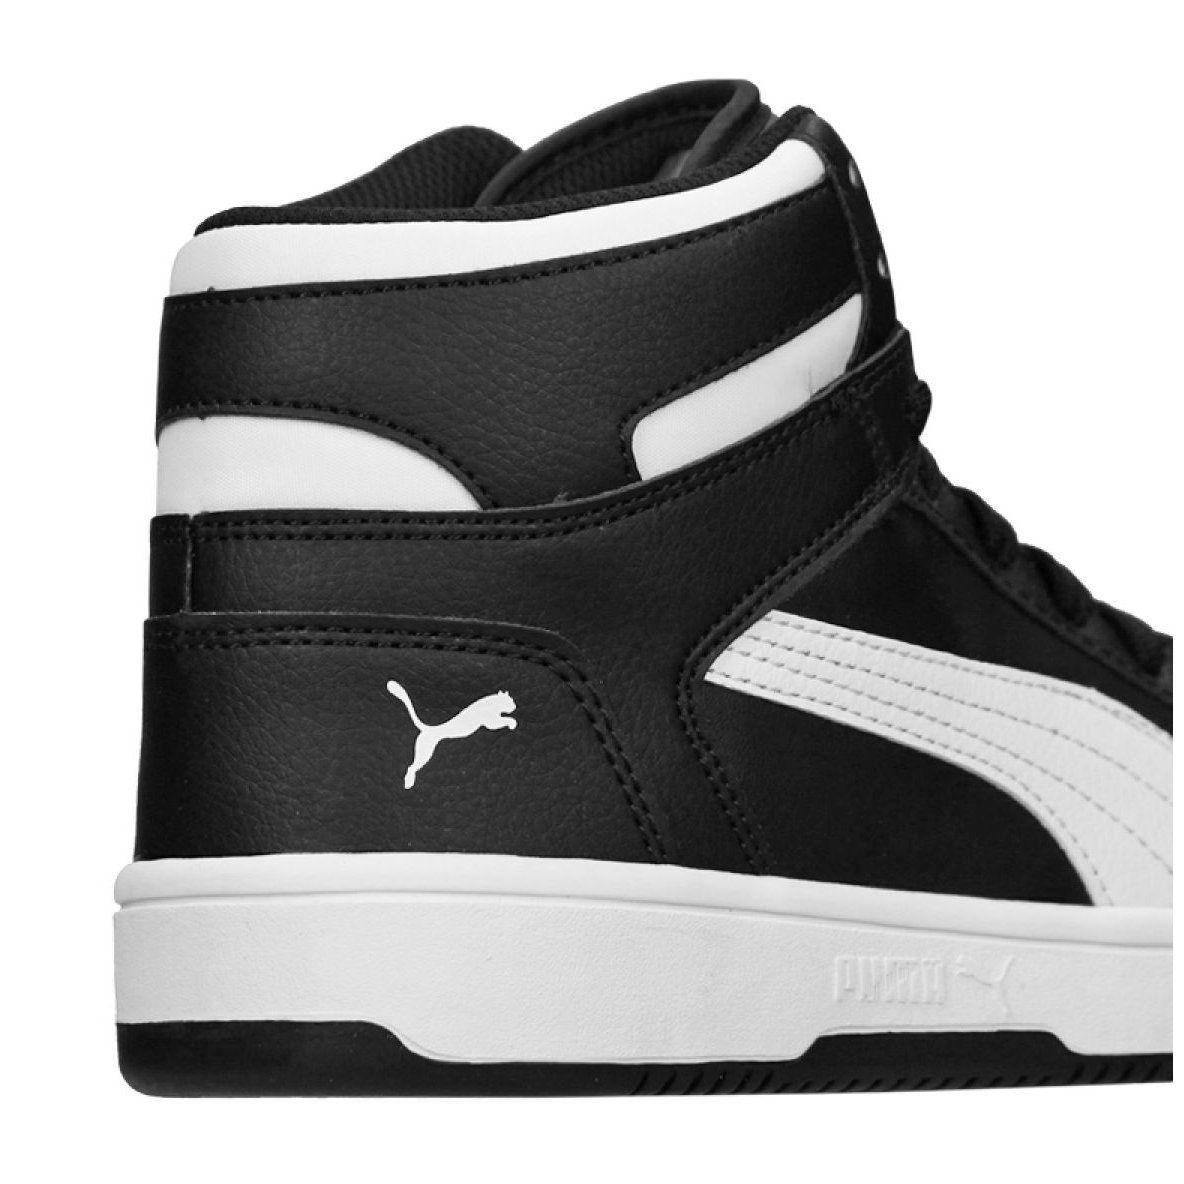 Puma Rebound Layup Sneakers Jr 370486 01 Shoes Black Junior Shoes Kid Shoes Black Shoes